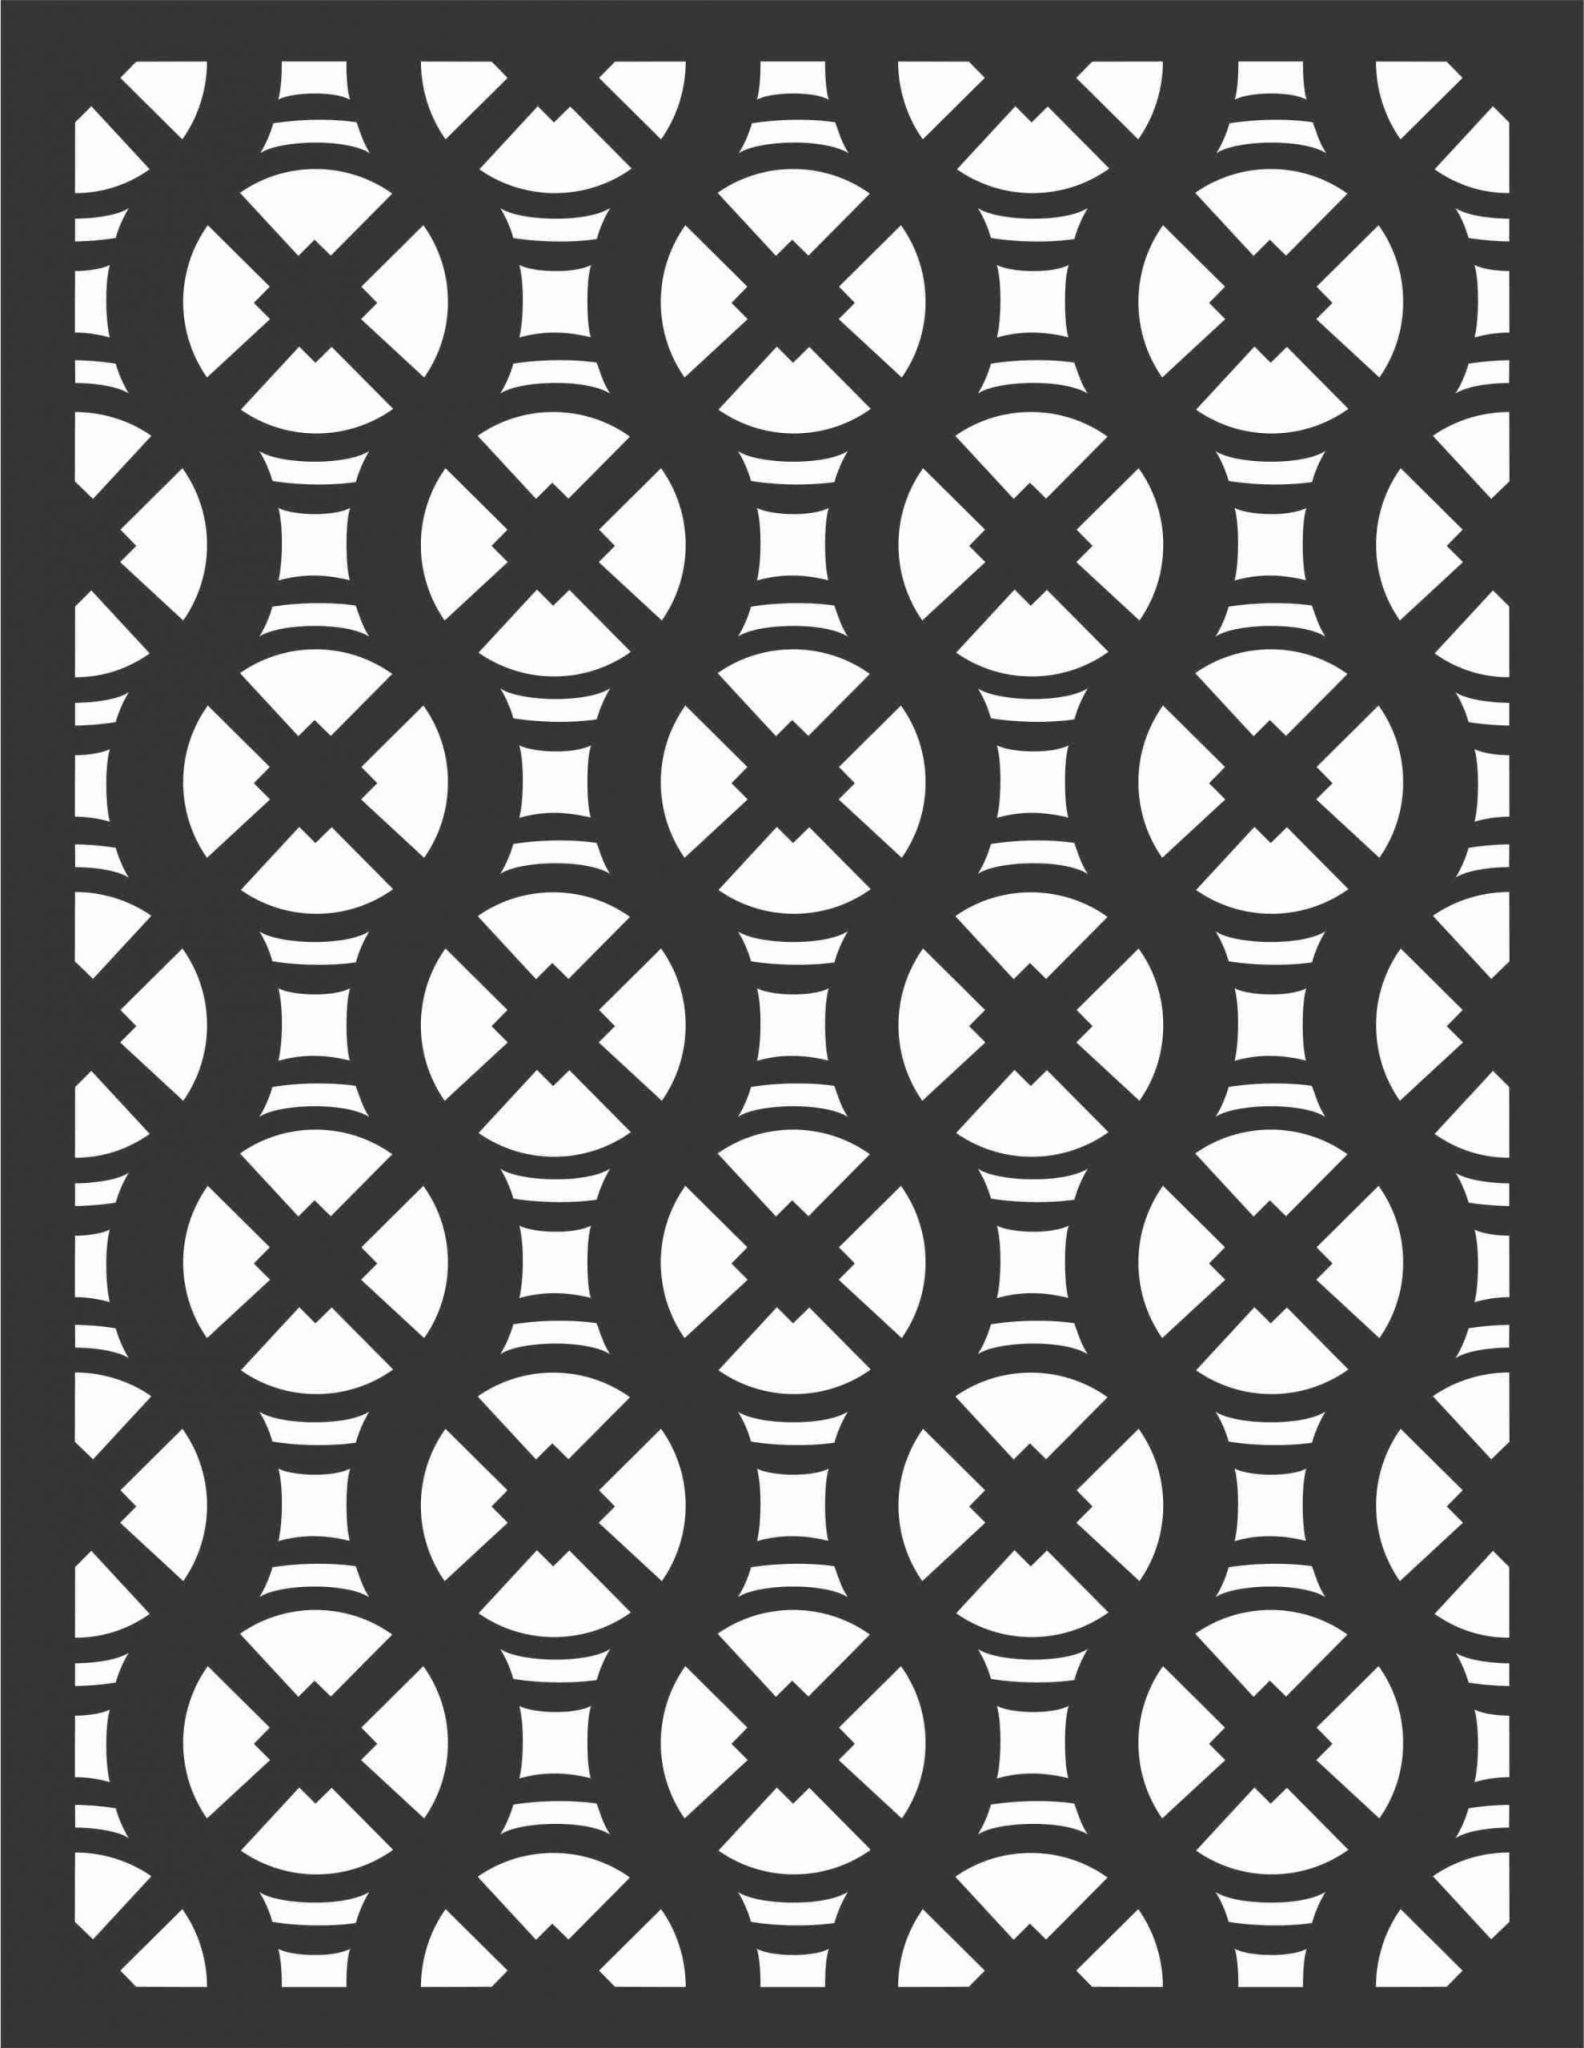 Screen Panel Patterns Seamless 37 Free DXF File